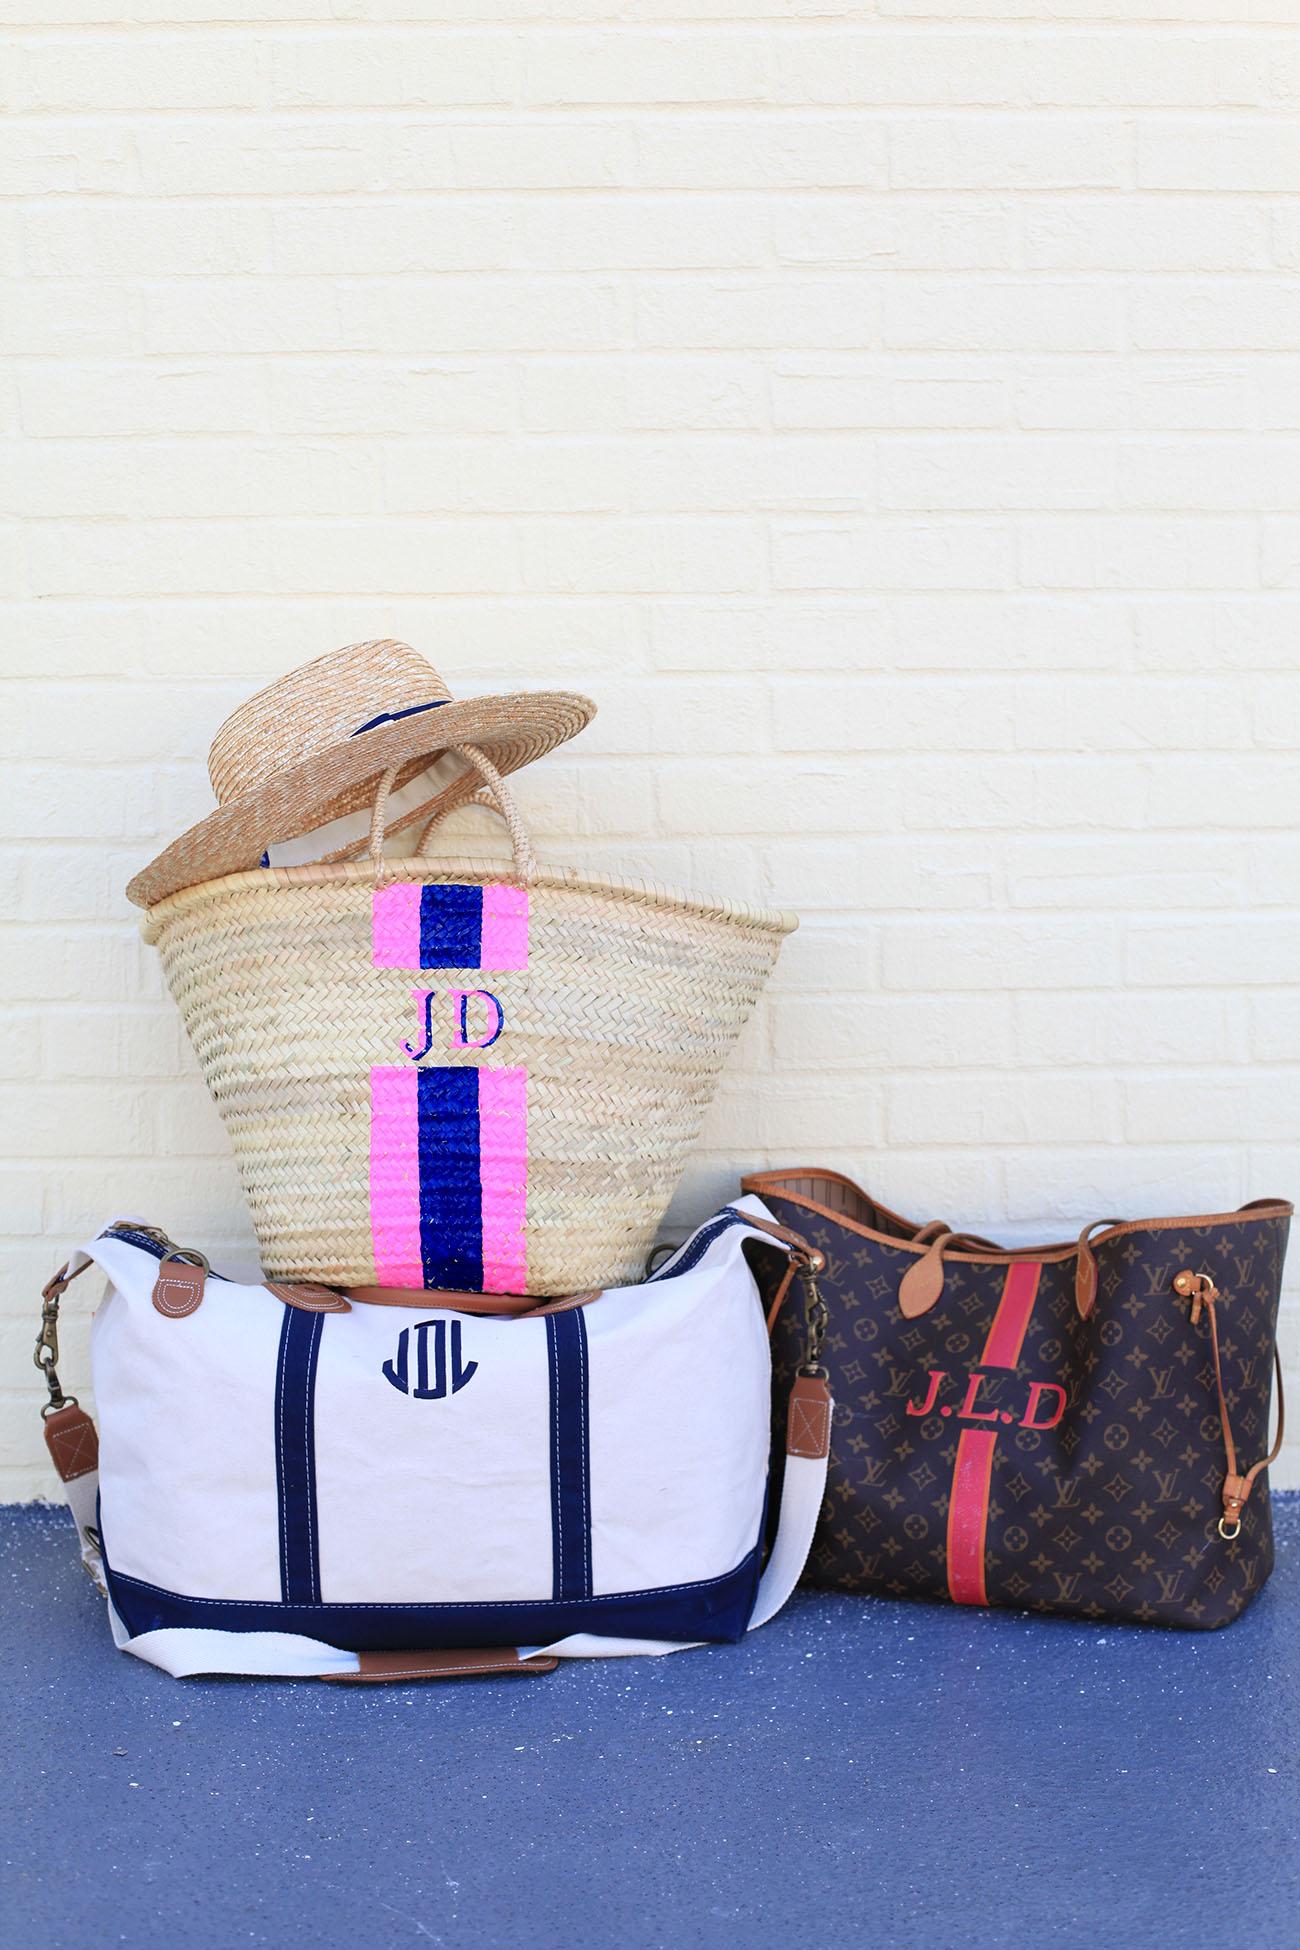 Monogrammed Travel Bags